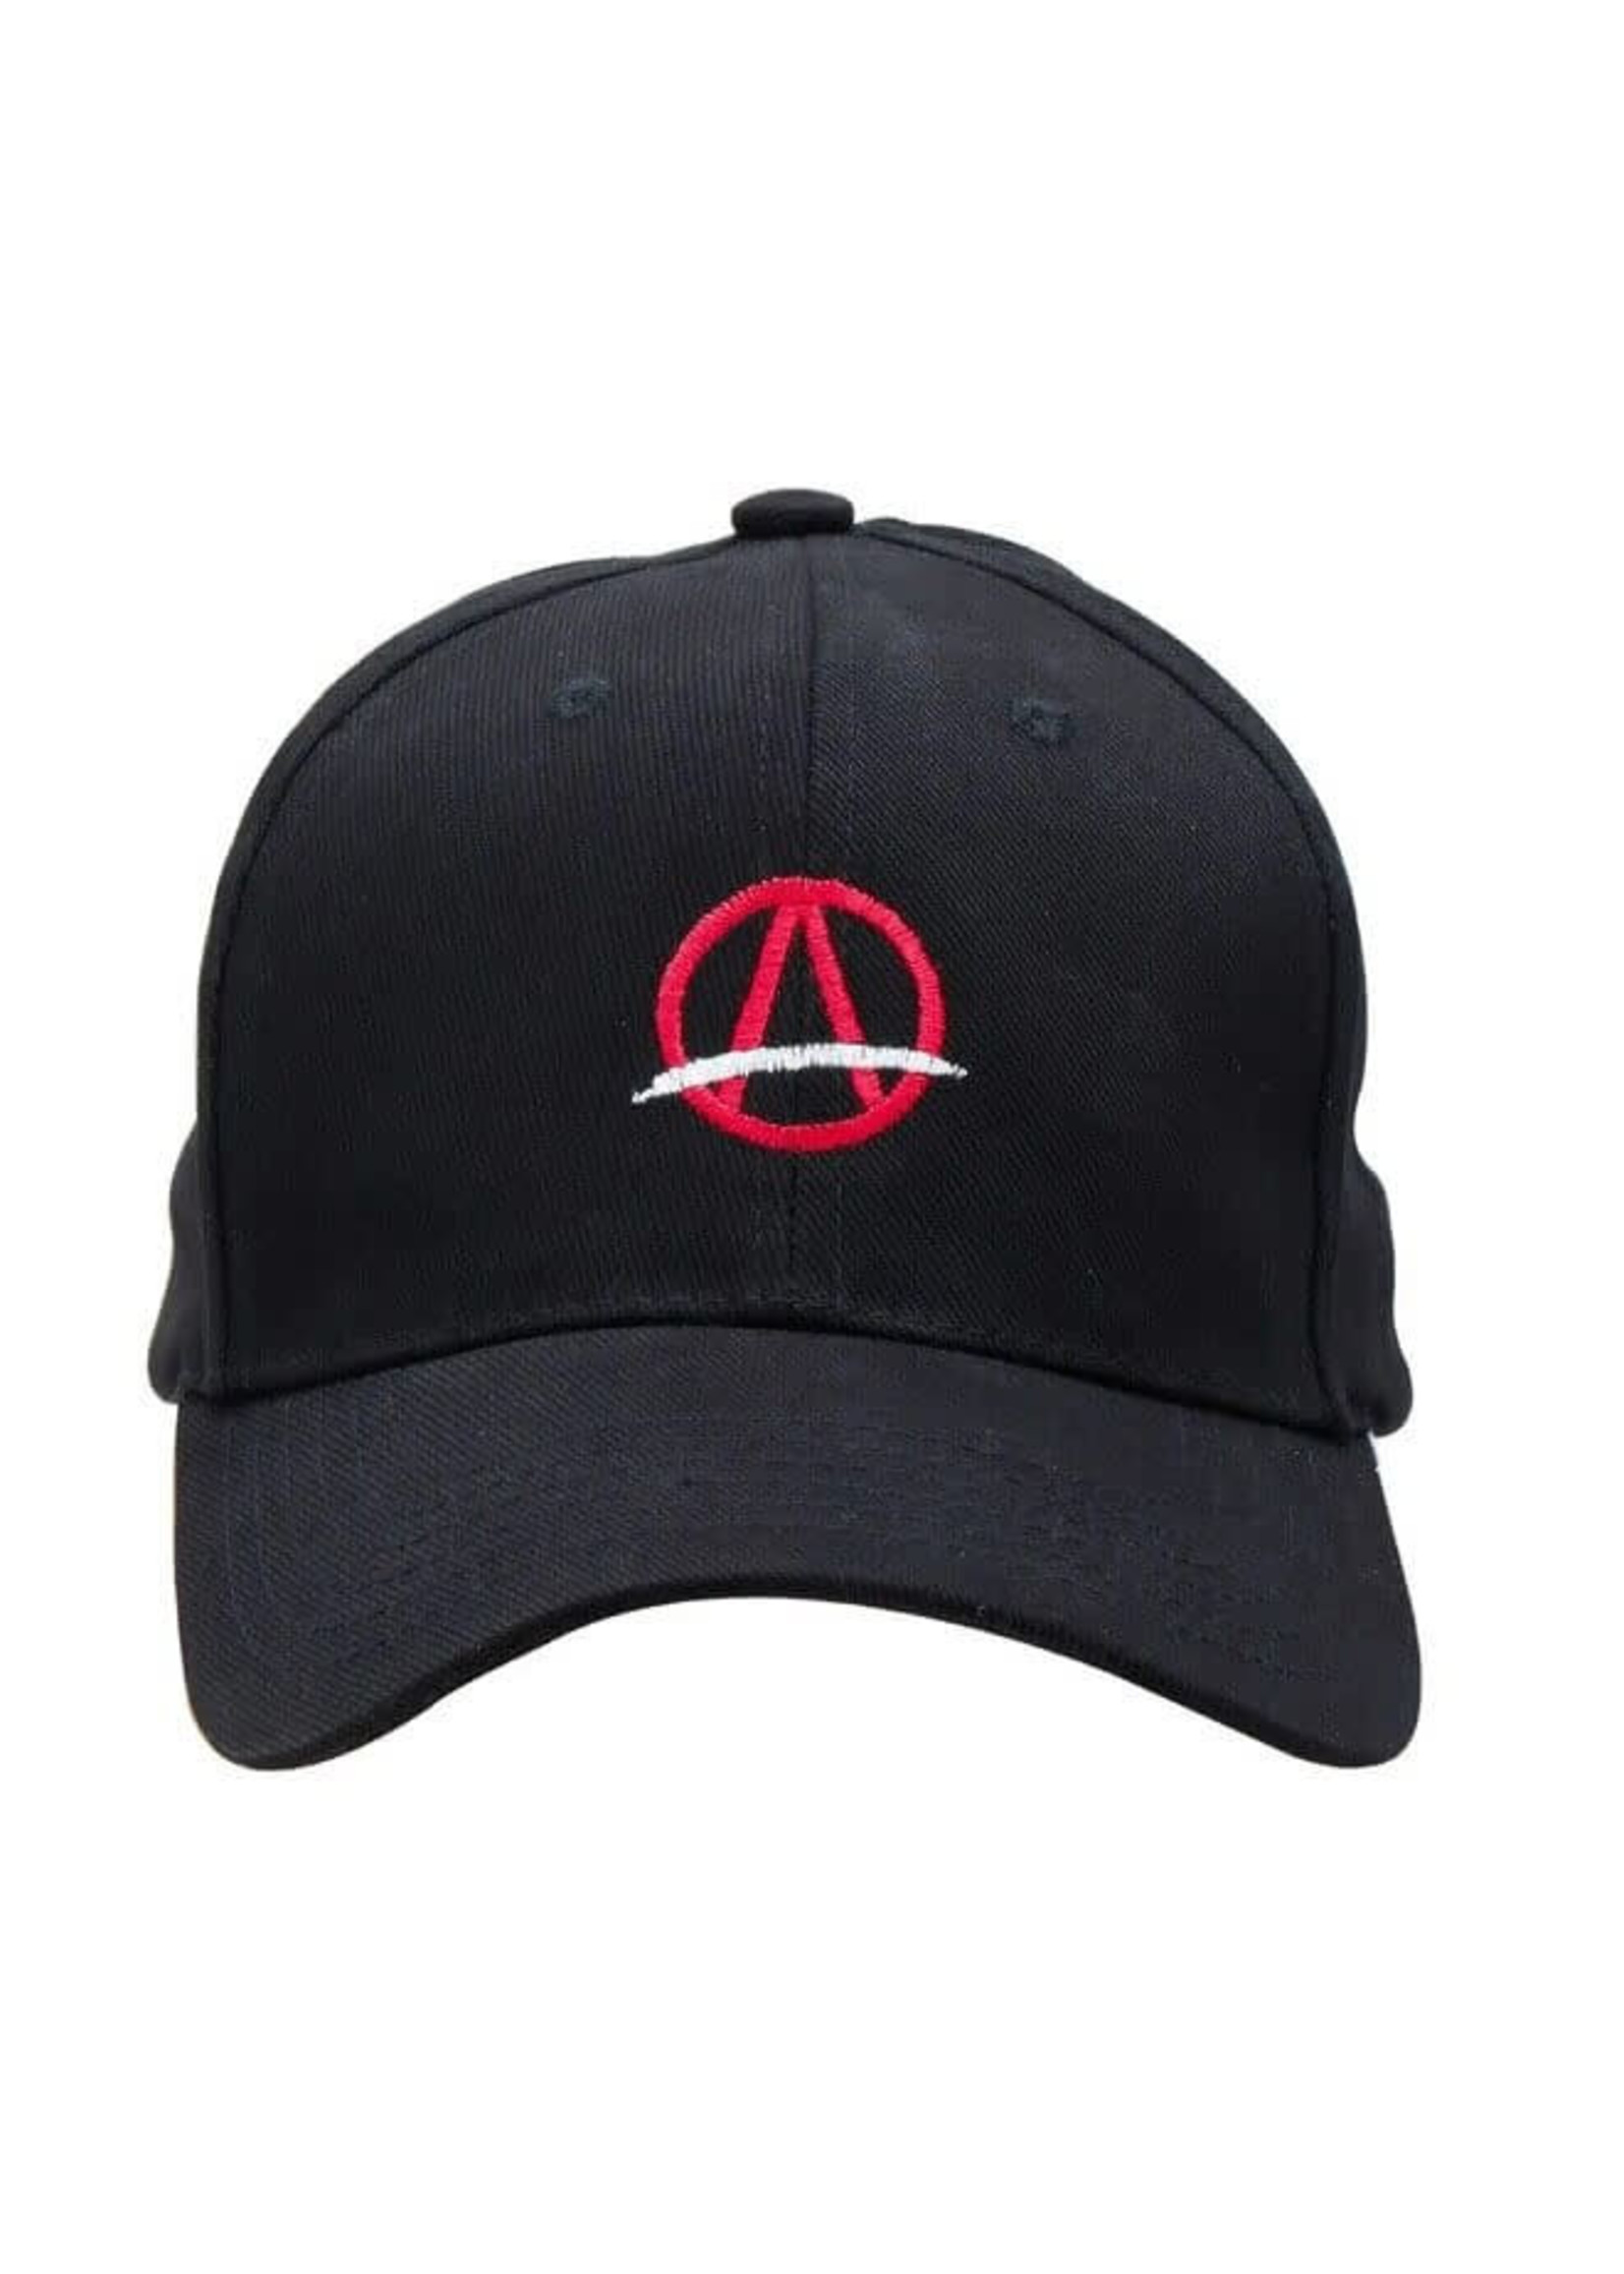 Apex Apex - Baseball Cap